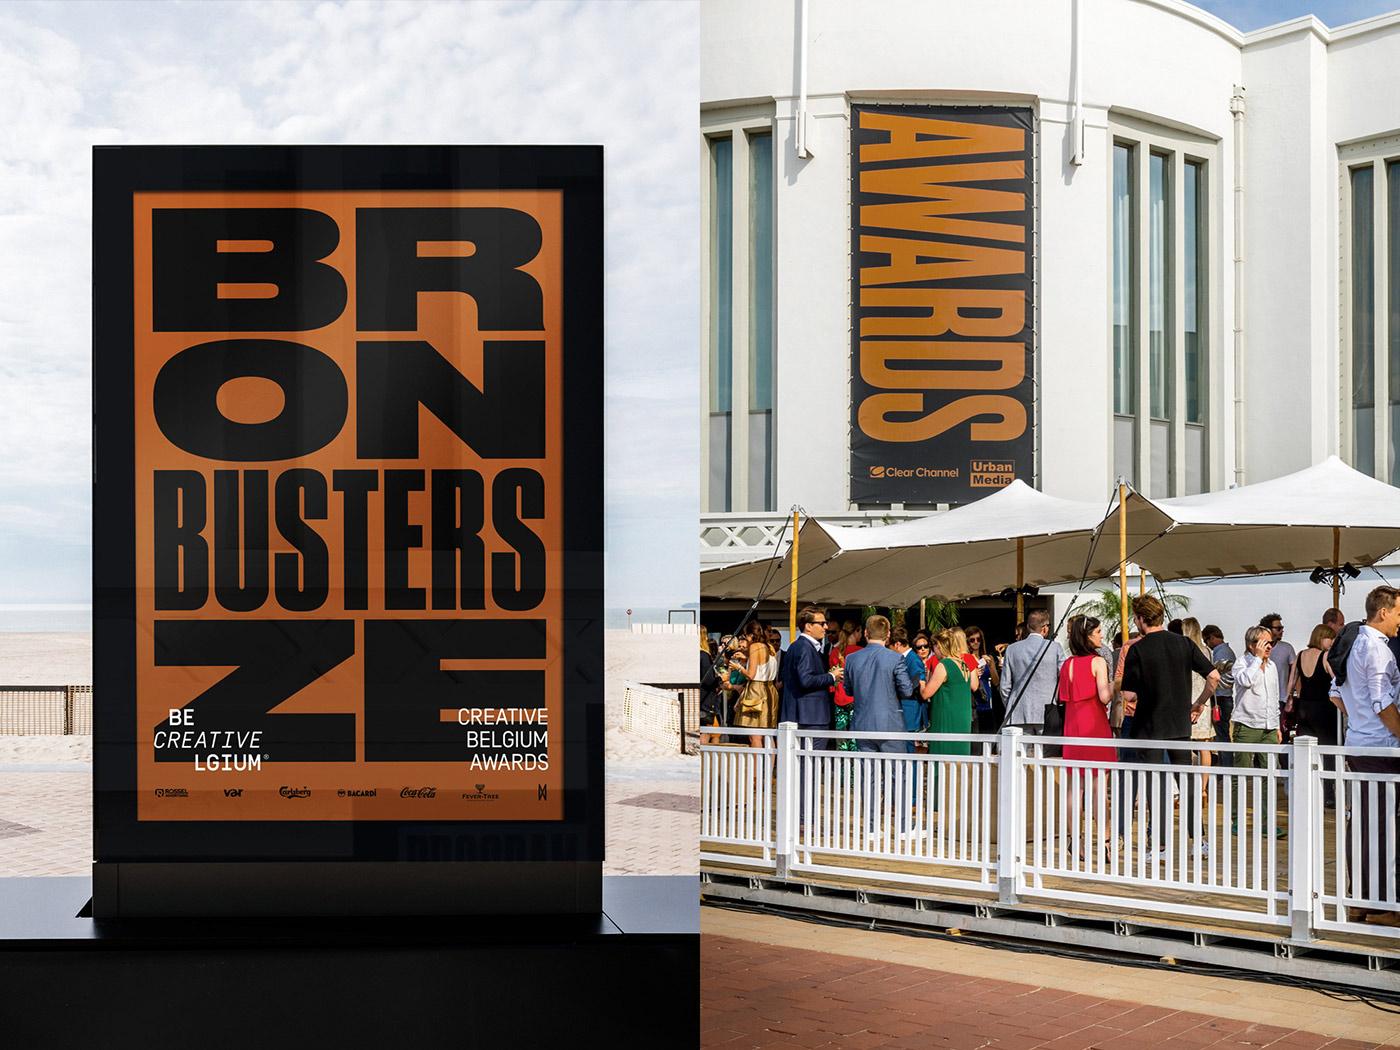 Creative Belgium Awards 2017 - Branding Inspiration & Poster Design